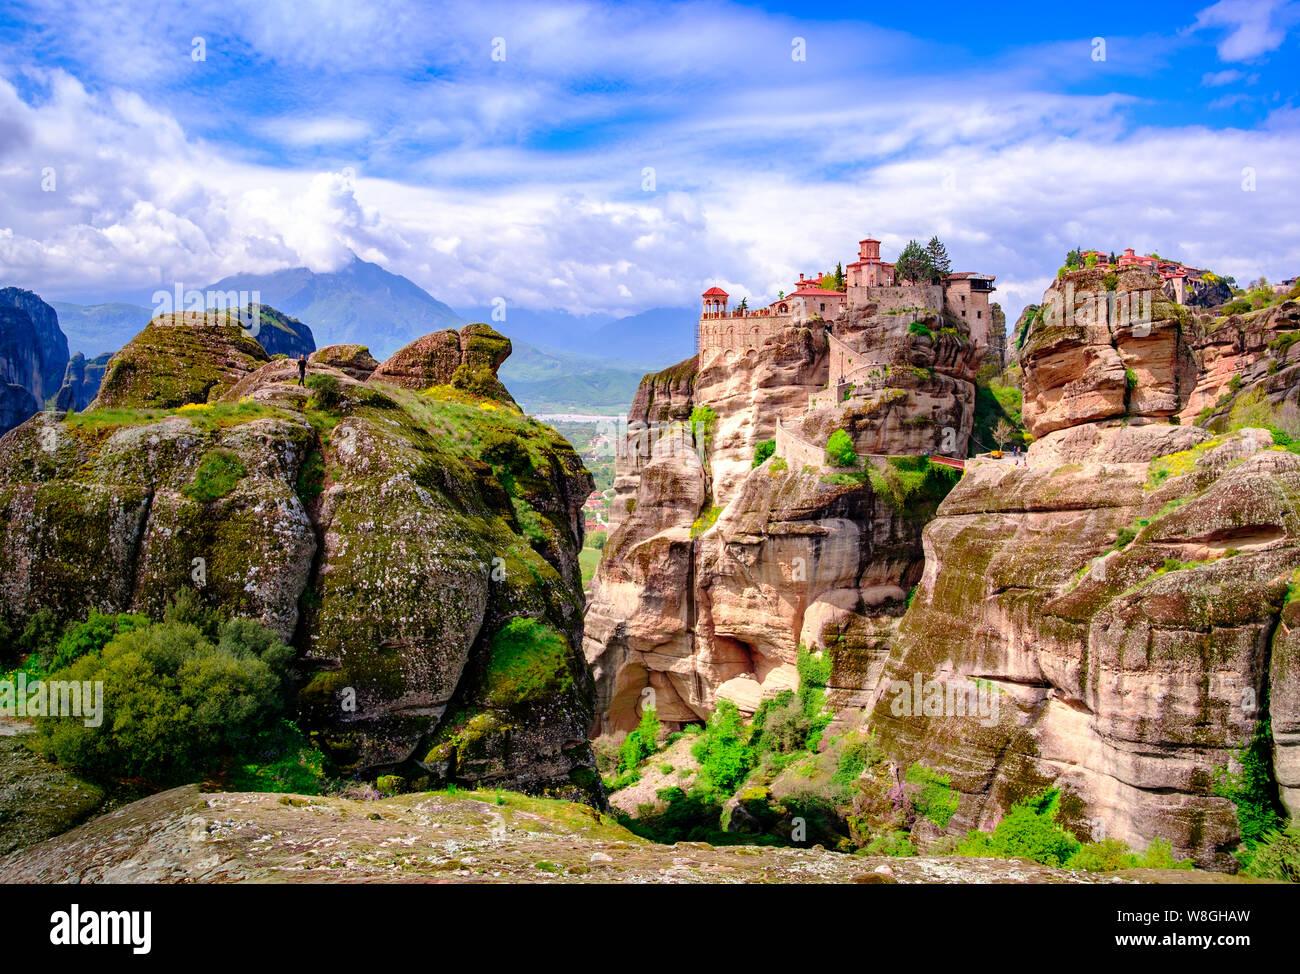 Panorama landscape photo of Meteora, UNESCO listed monastery complex, Greece Stock Photo